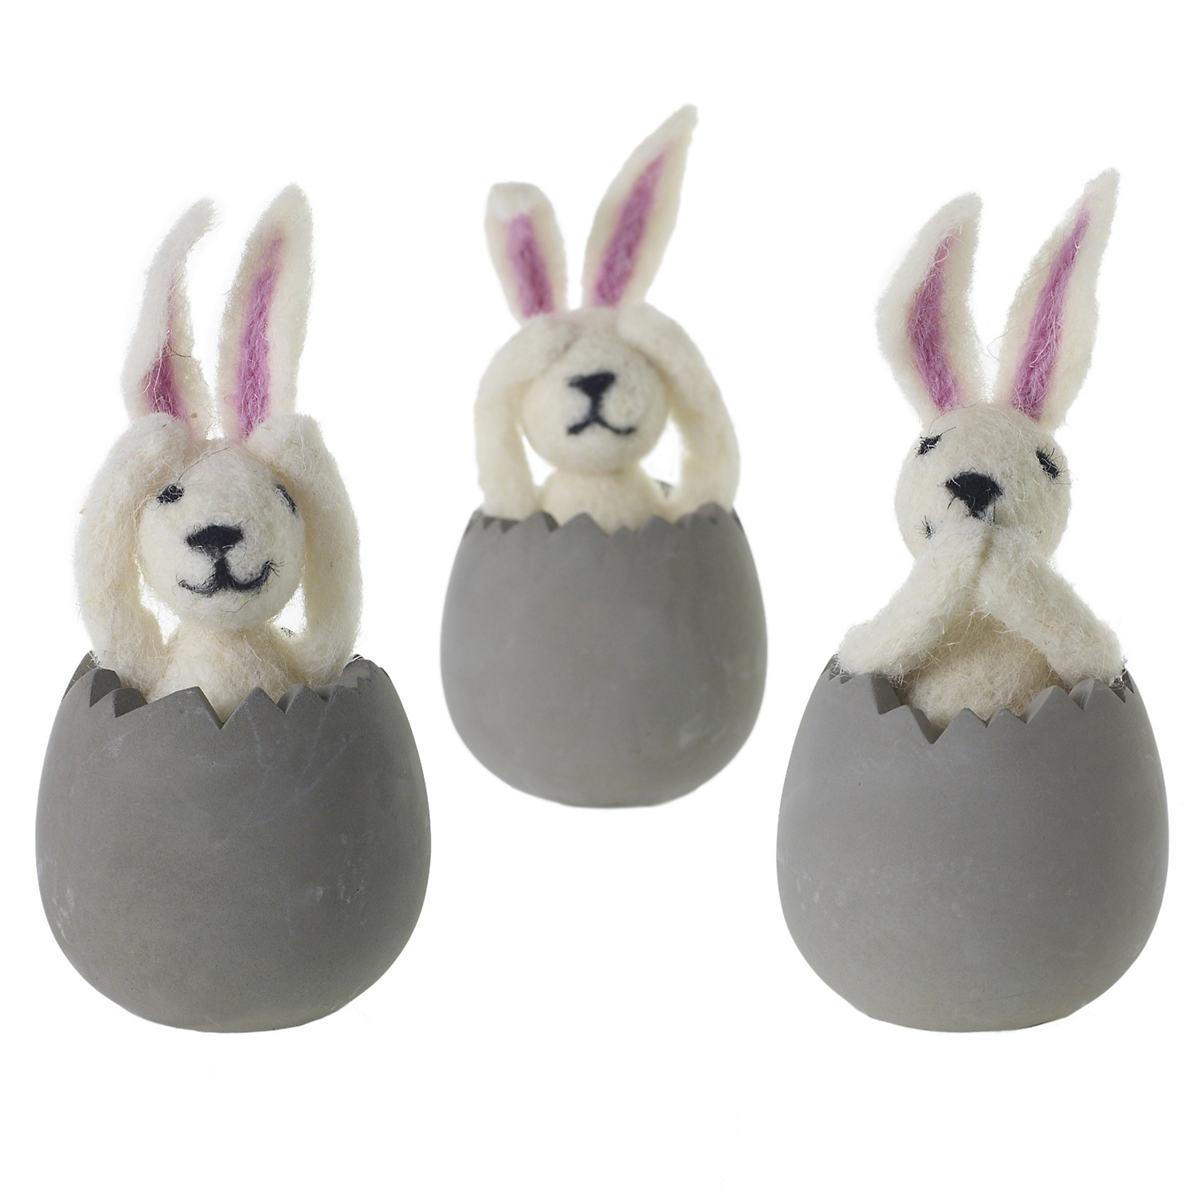 Three Wise Bunnies